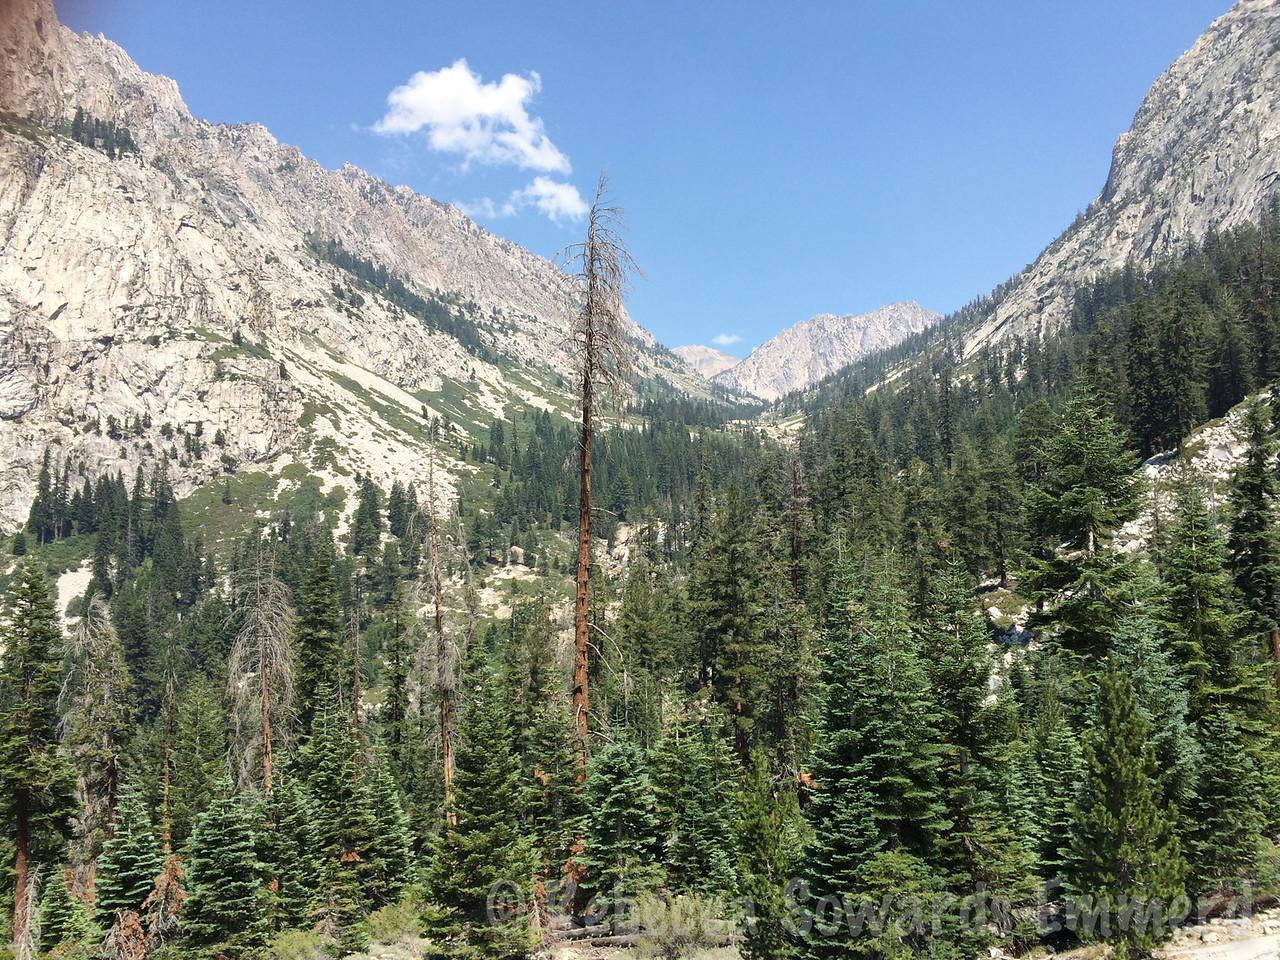 Climbing to east lake - great views